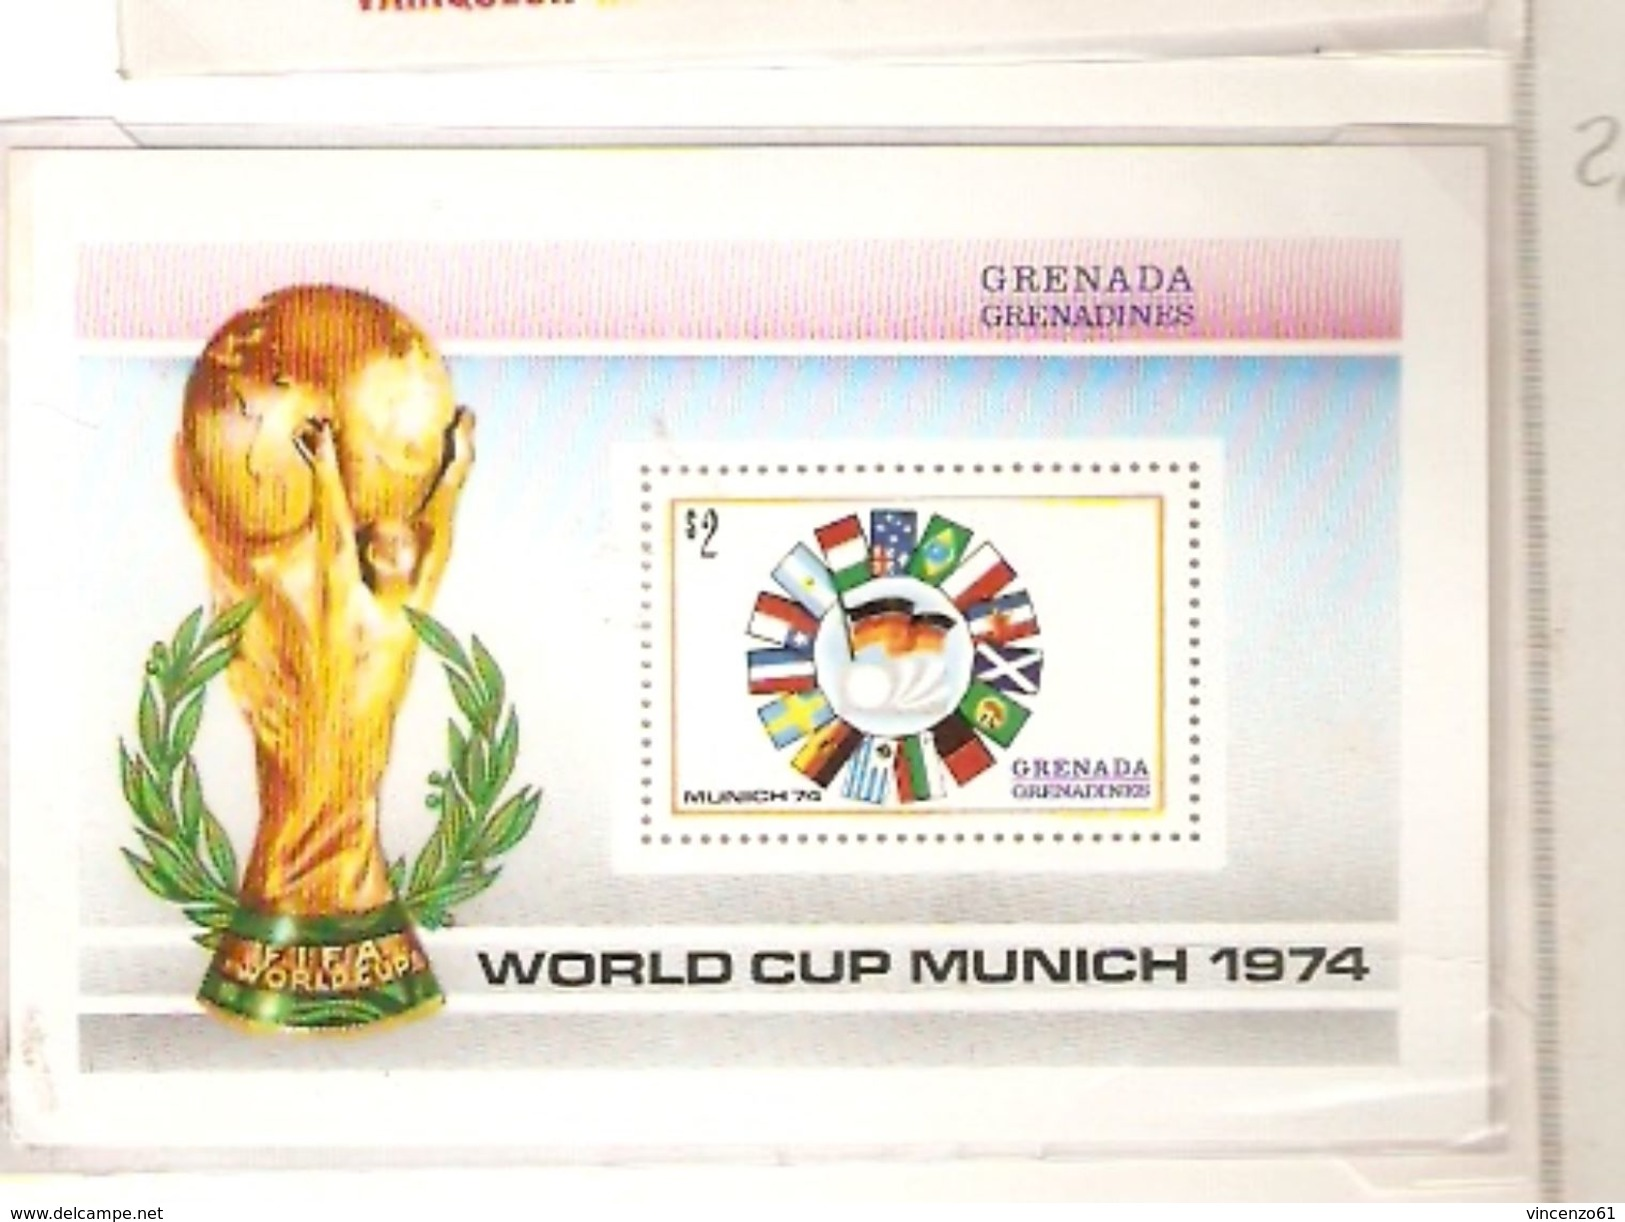 GRENADA GRENADINES FIFA WORLD CUP 1974 GERMANY 1974 - Coppa Del Mondo